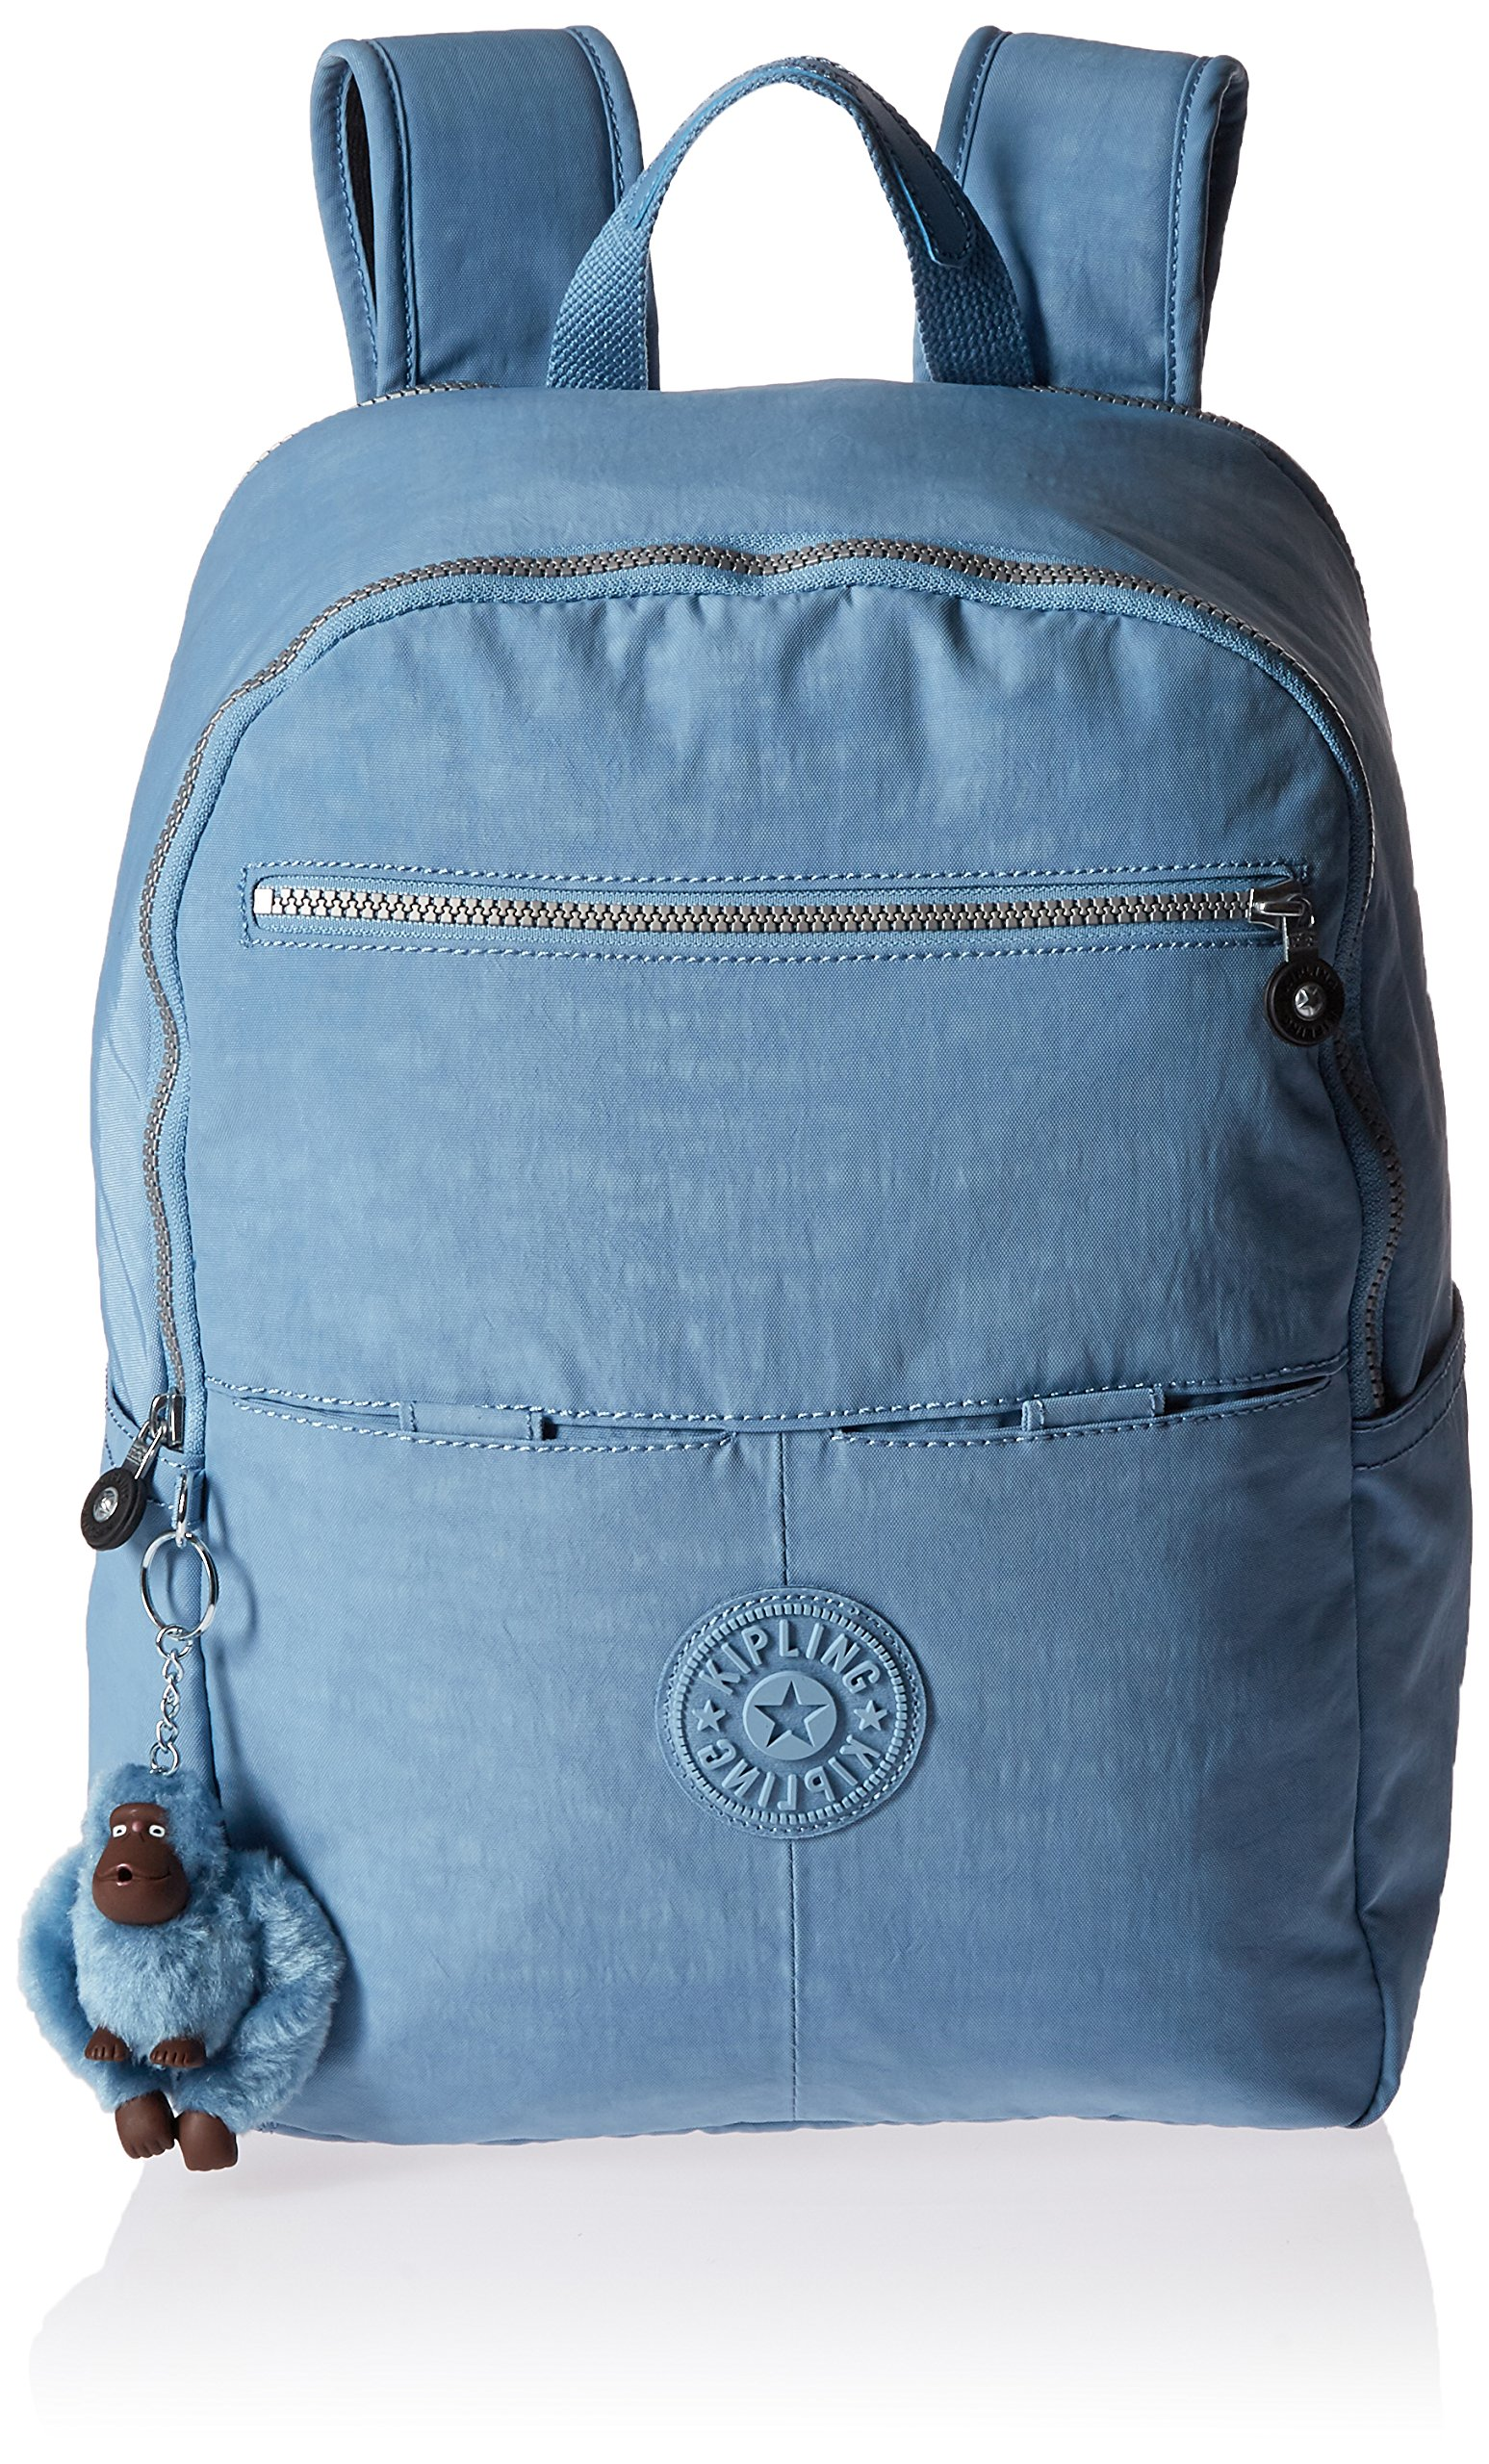 Kipling Women's Aideen Solid Backpack, Blue/Grey